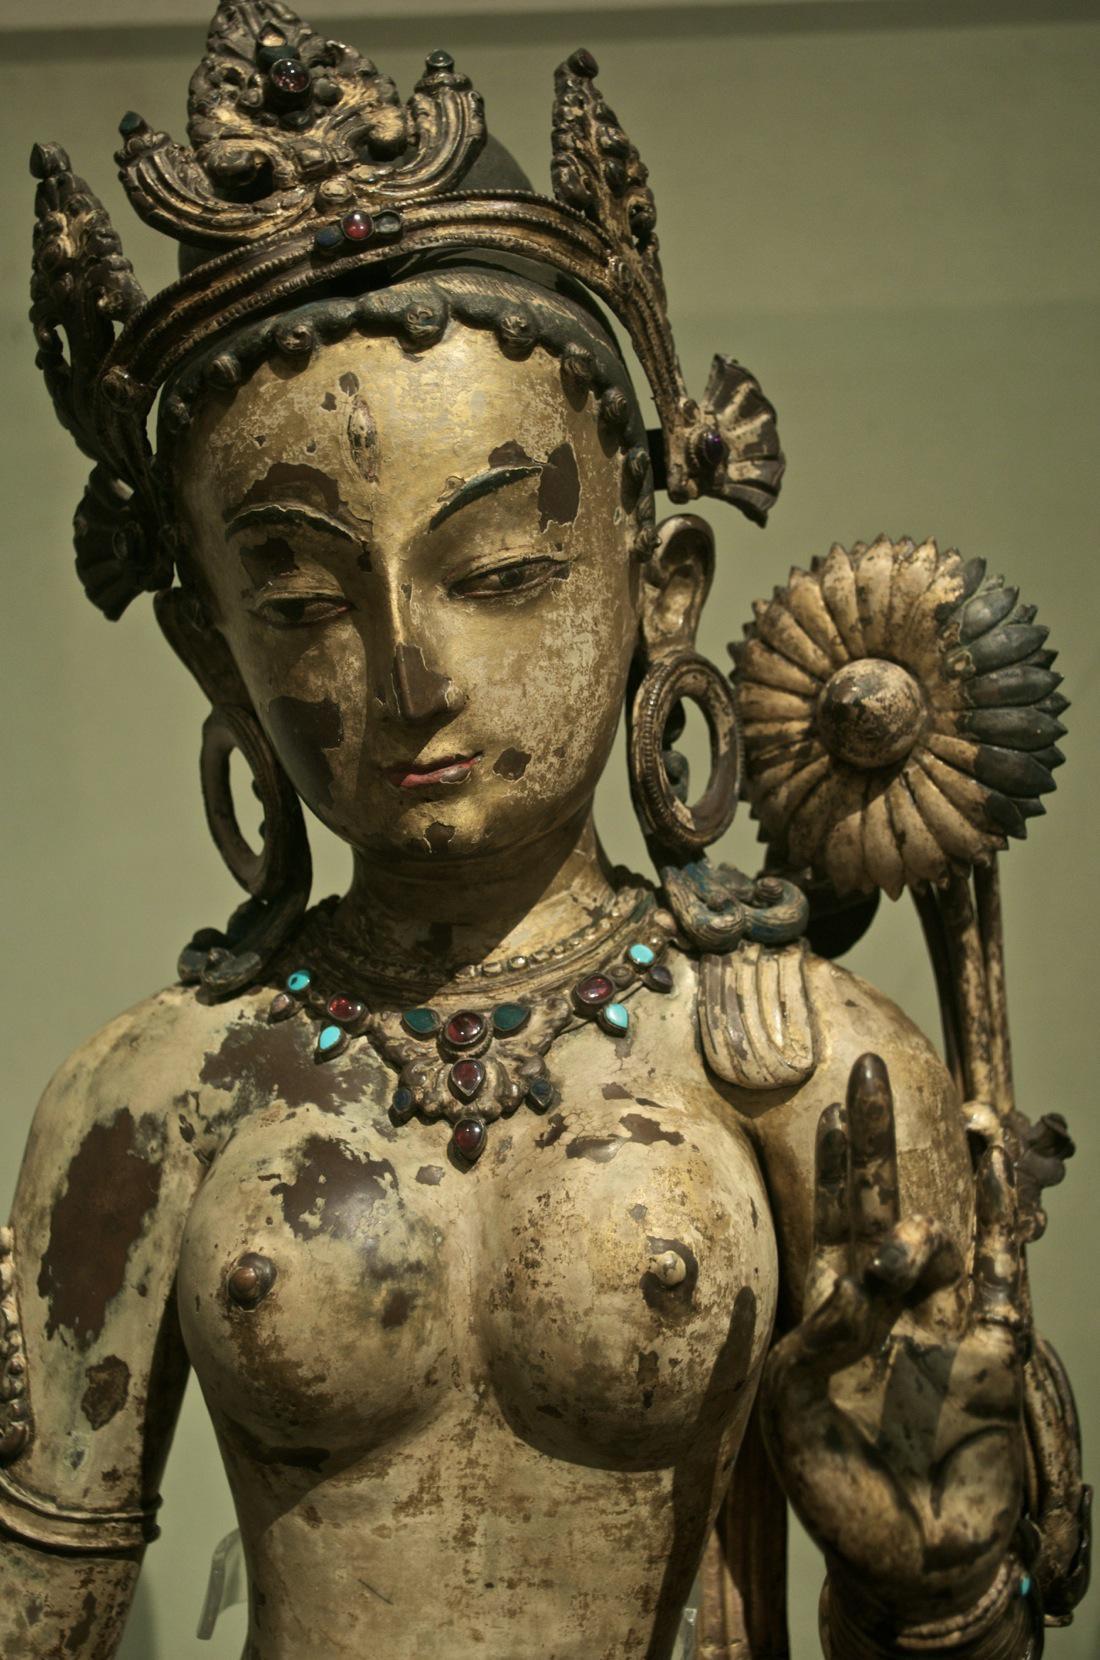 The Buddhist Goddess Sitatara, Victoria and Albert Museum, London, by Peter Rivera